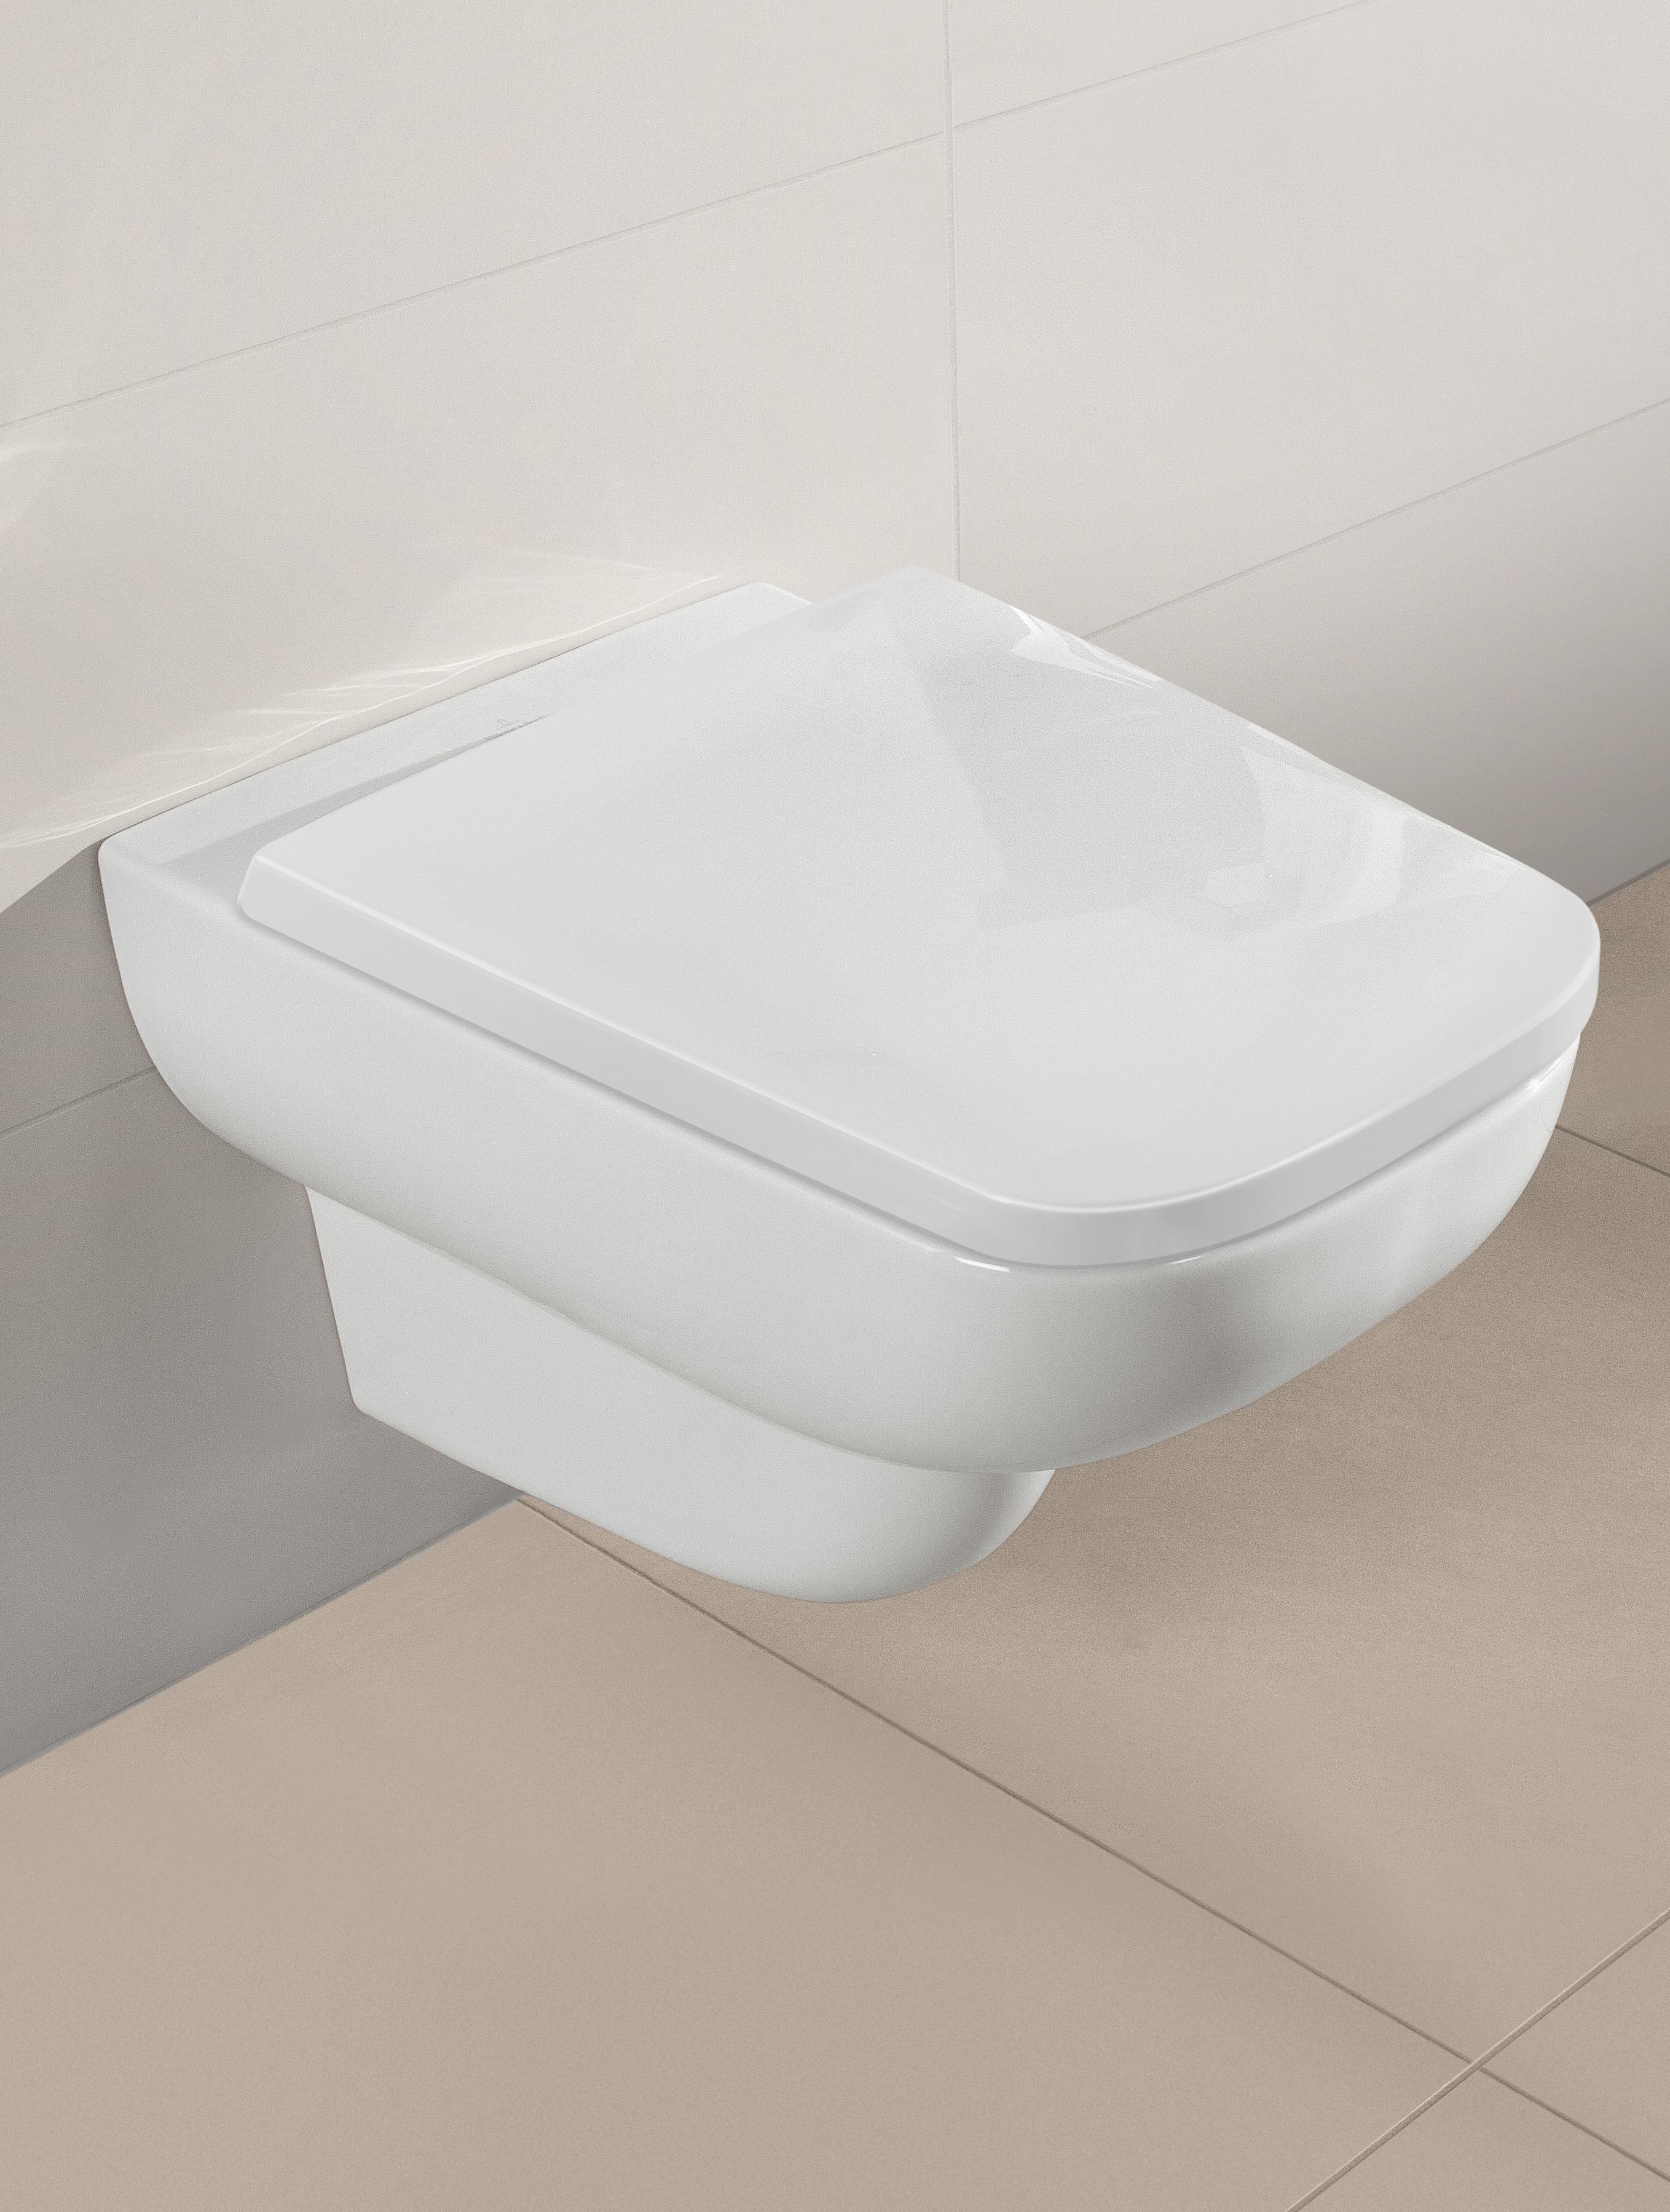 Joyce WC, Wall-mounted WC, Toilets, Washdown WC